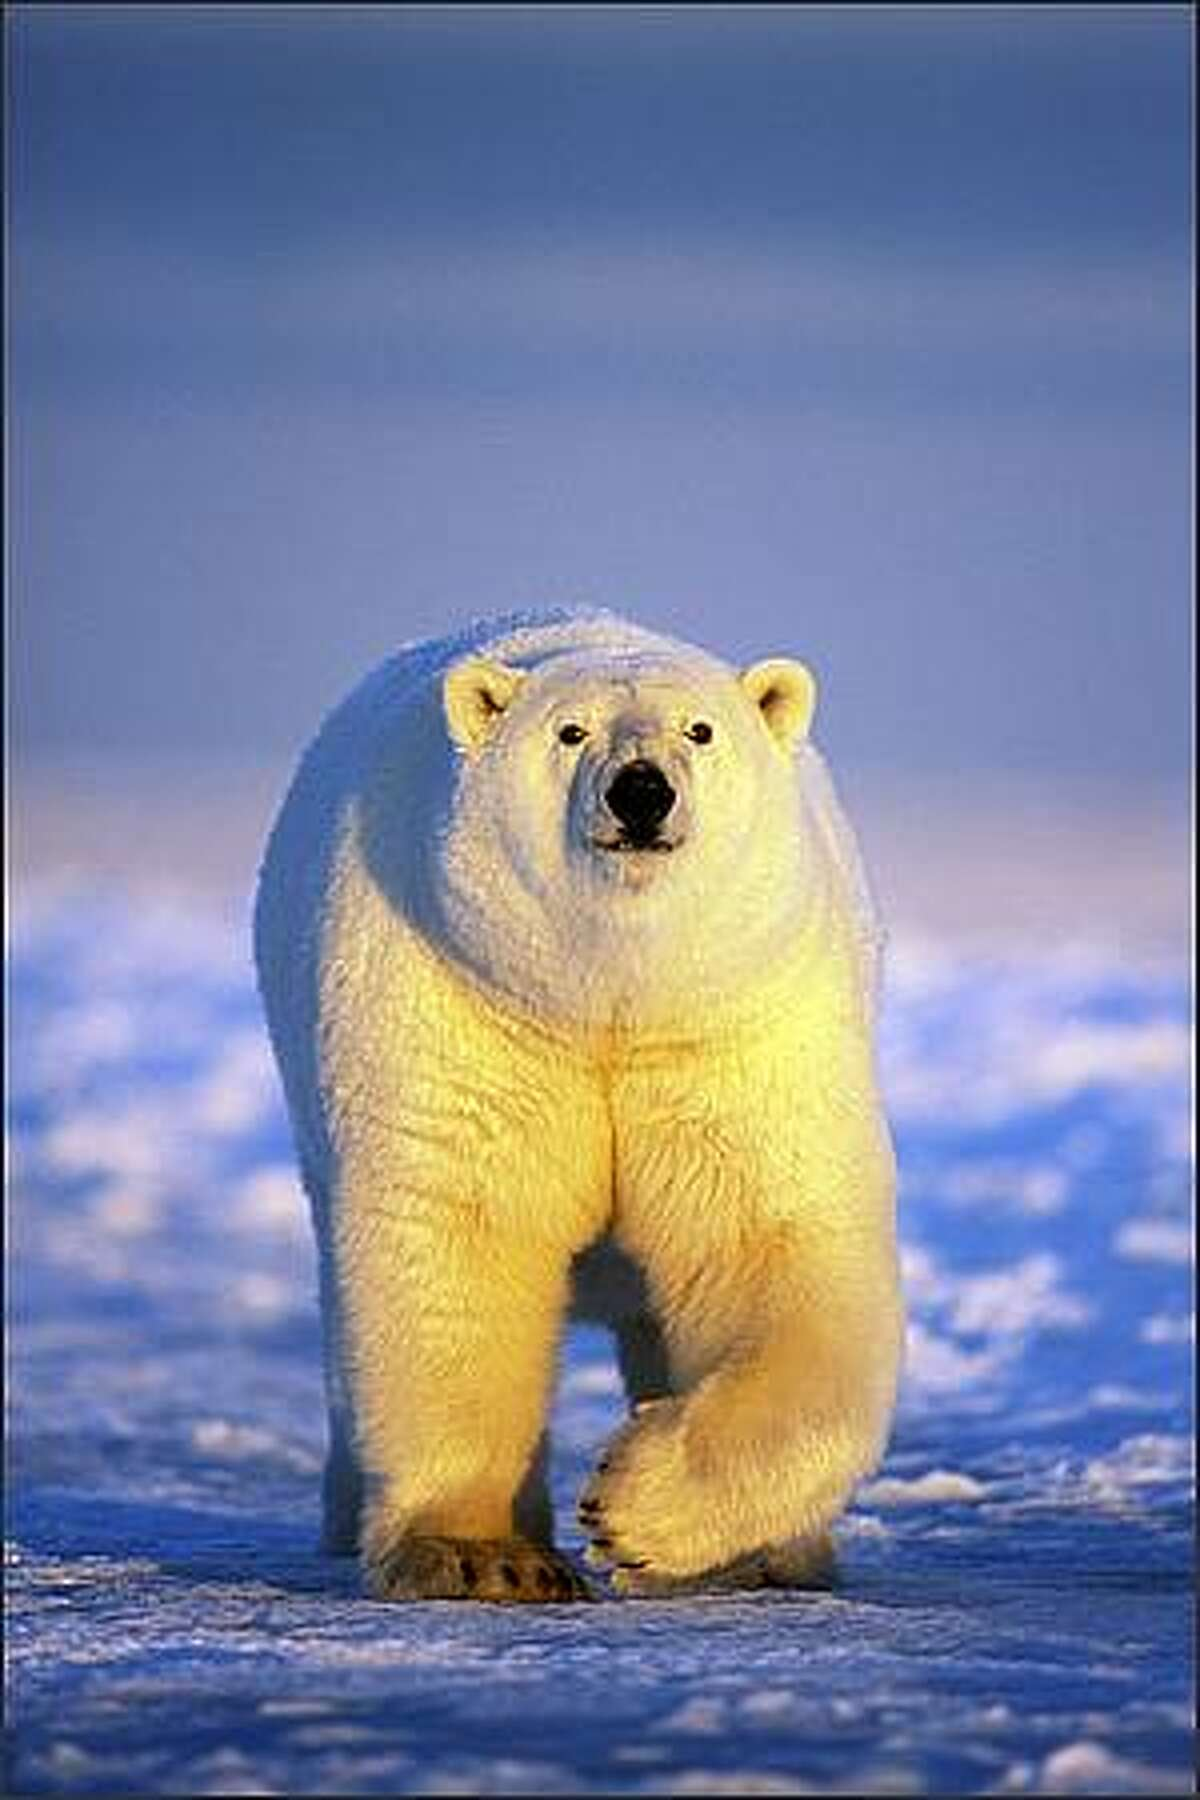 Polar bear on the pack ice of the frozen coastal plain (Arctic National Wildlife Refuge), photograph by Steven Kazlowski.